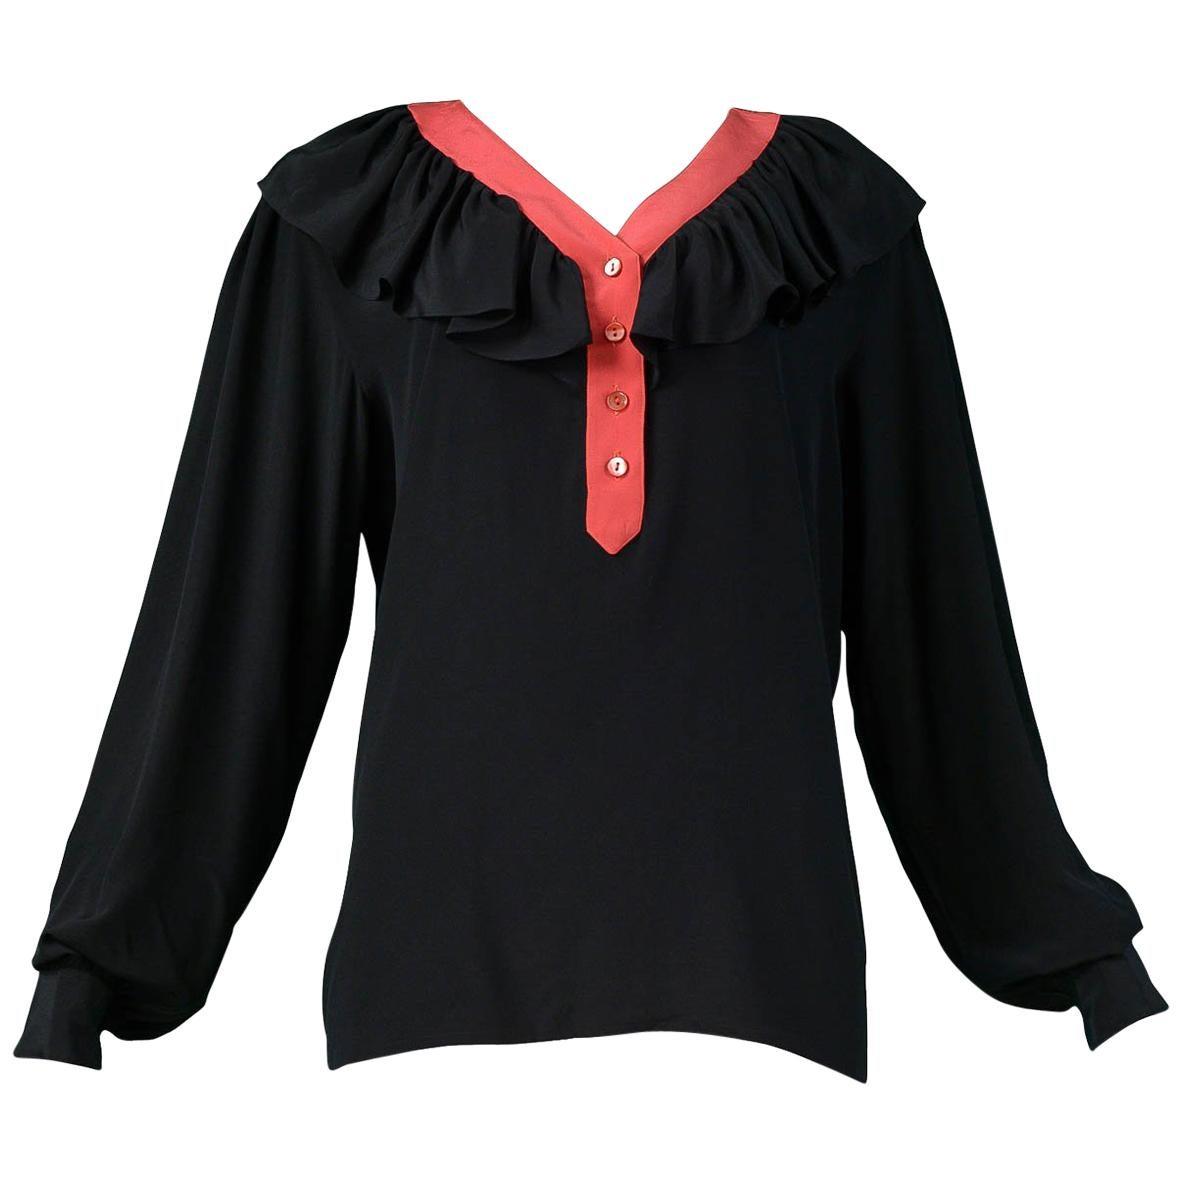 Vintage Yves Saint Laurent Black & Red Silk Ruffle Blosue